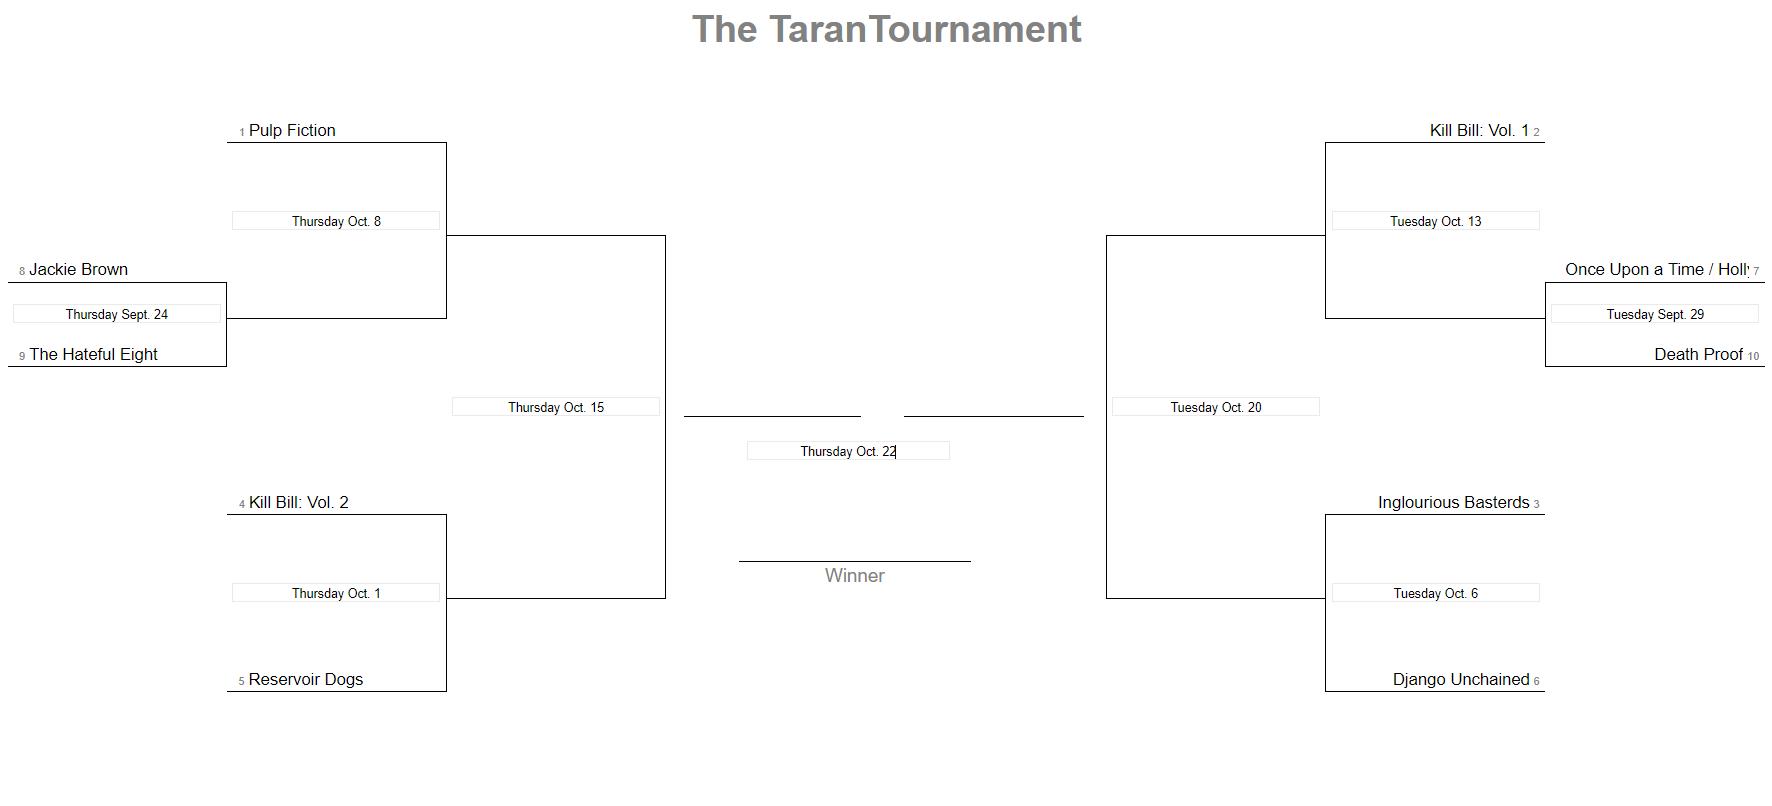 The TaranTournament